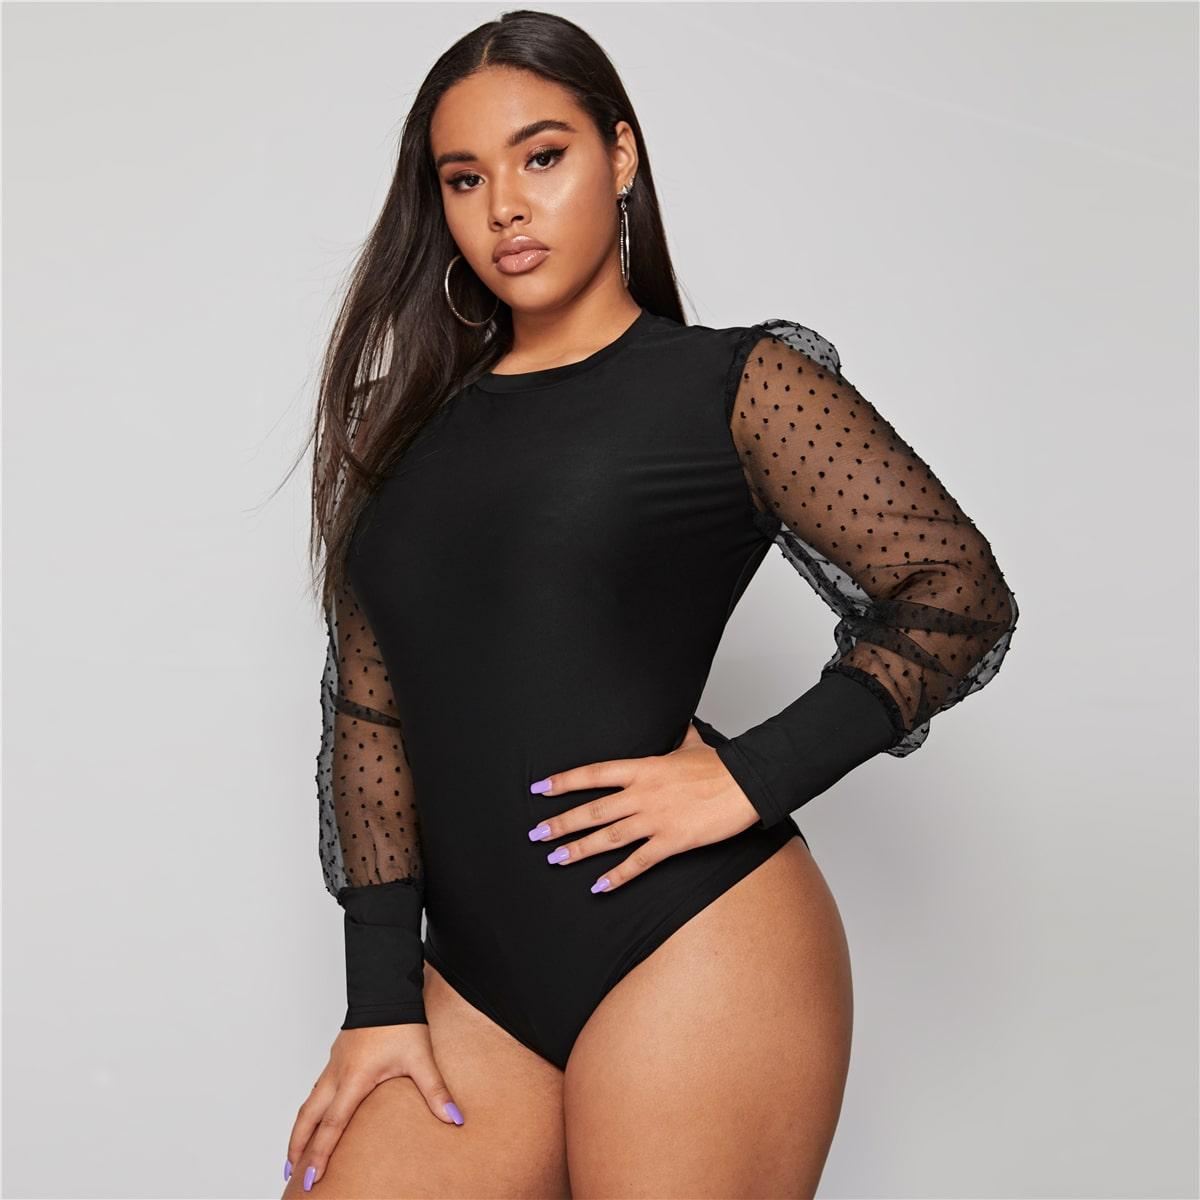 Zwart Elegant Stippen Bodysuits grote maten Contrast mesh